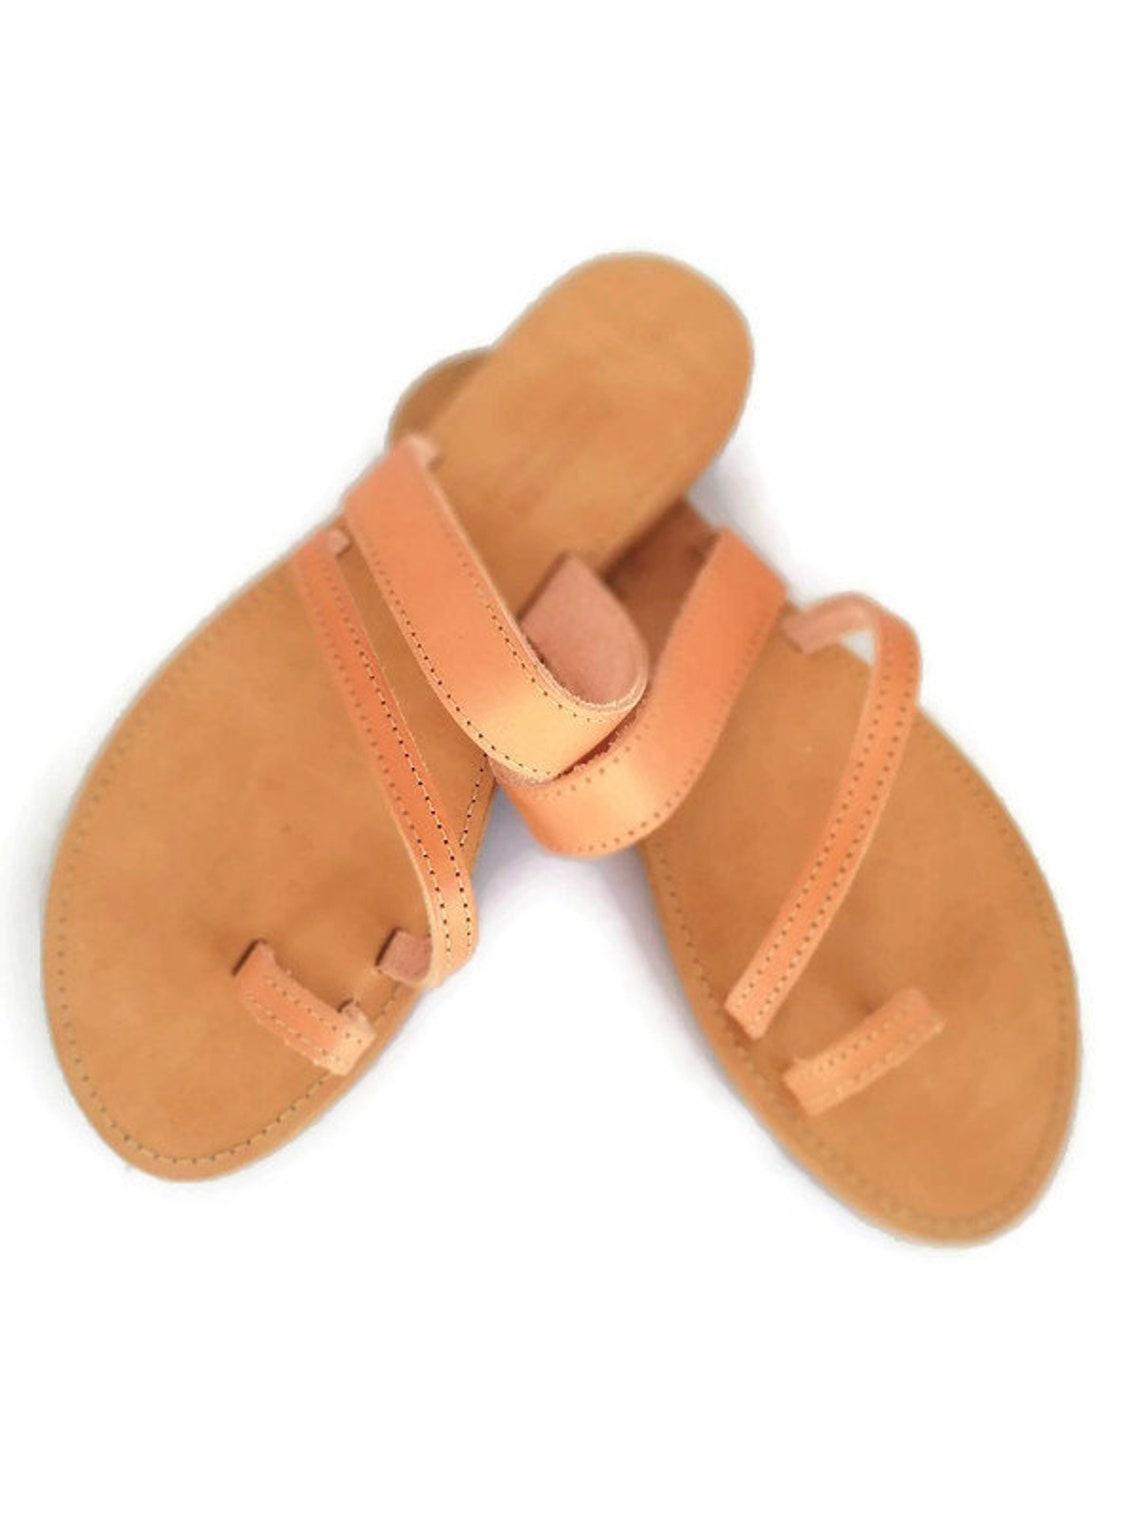 Leather Handmade Greek Sandals - Big Sale T8gli